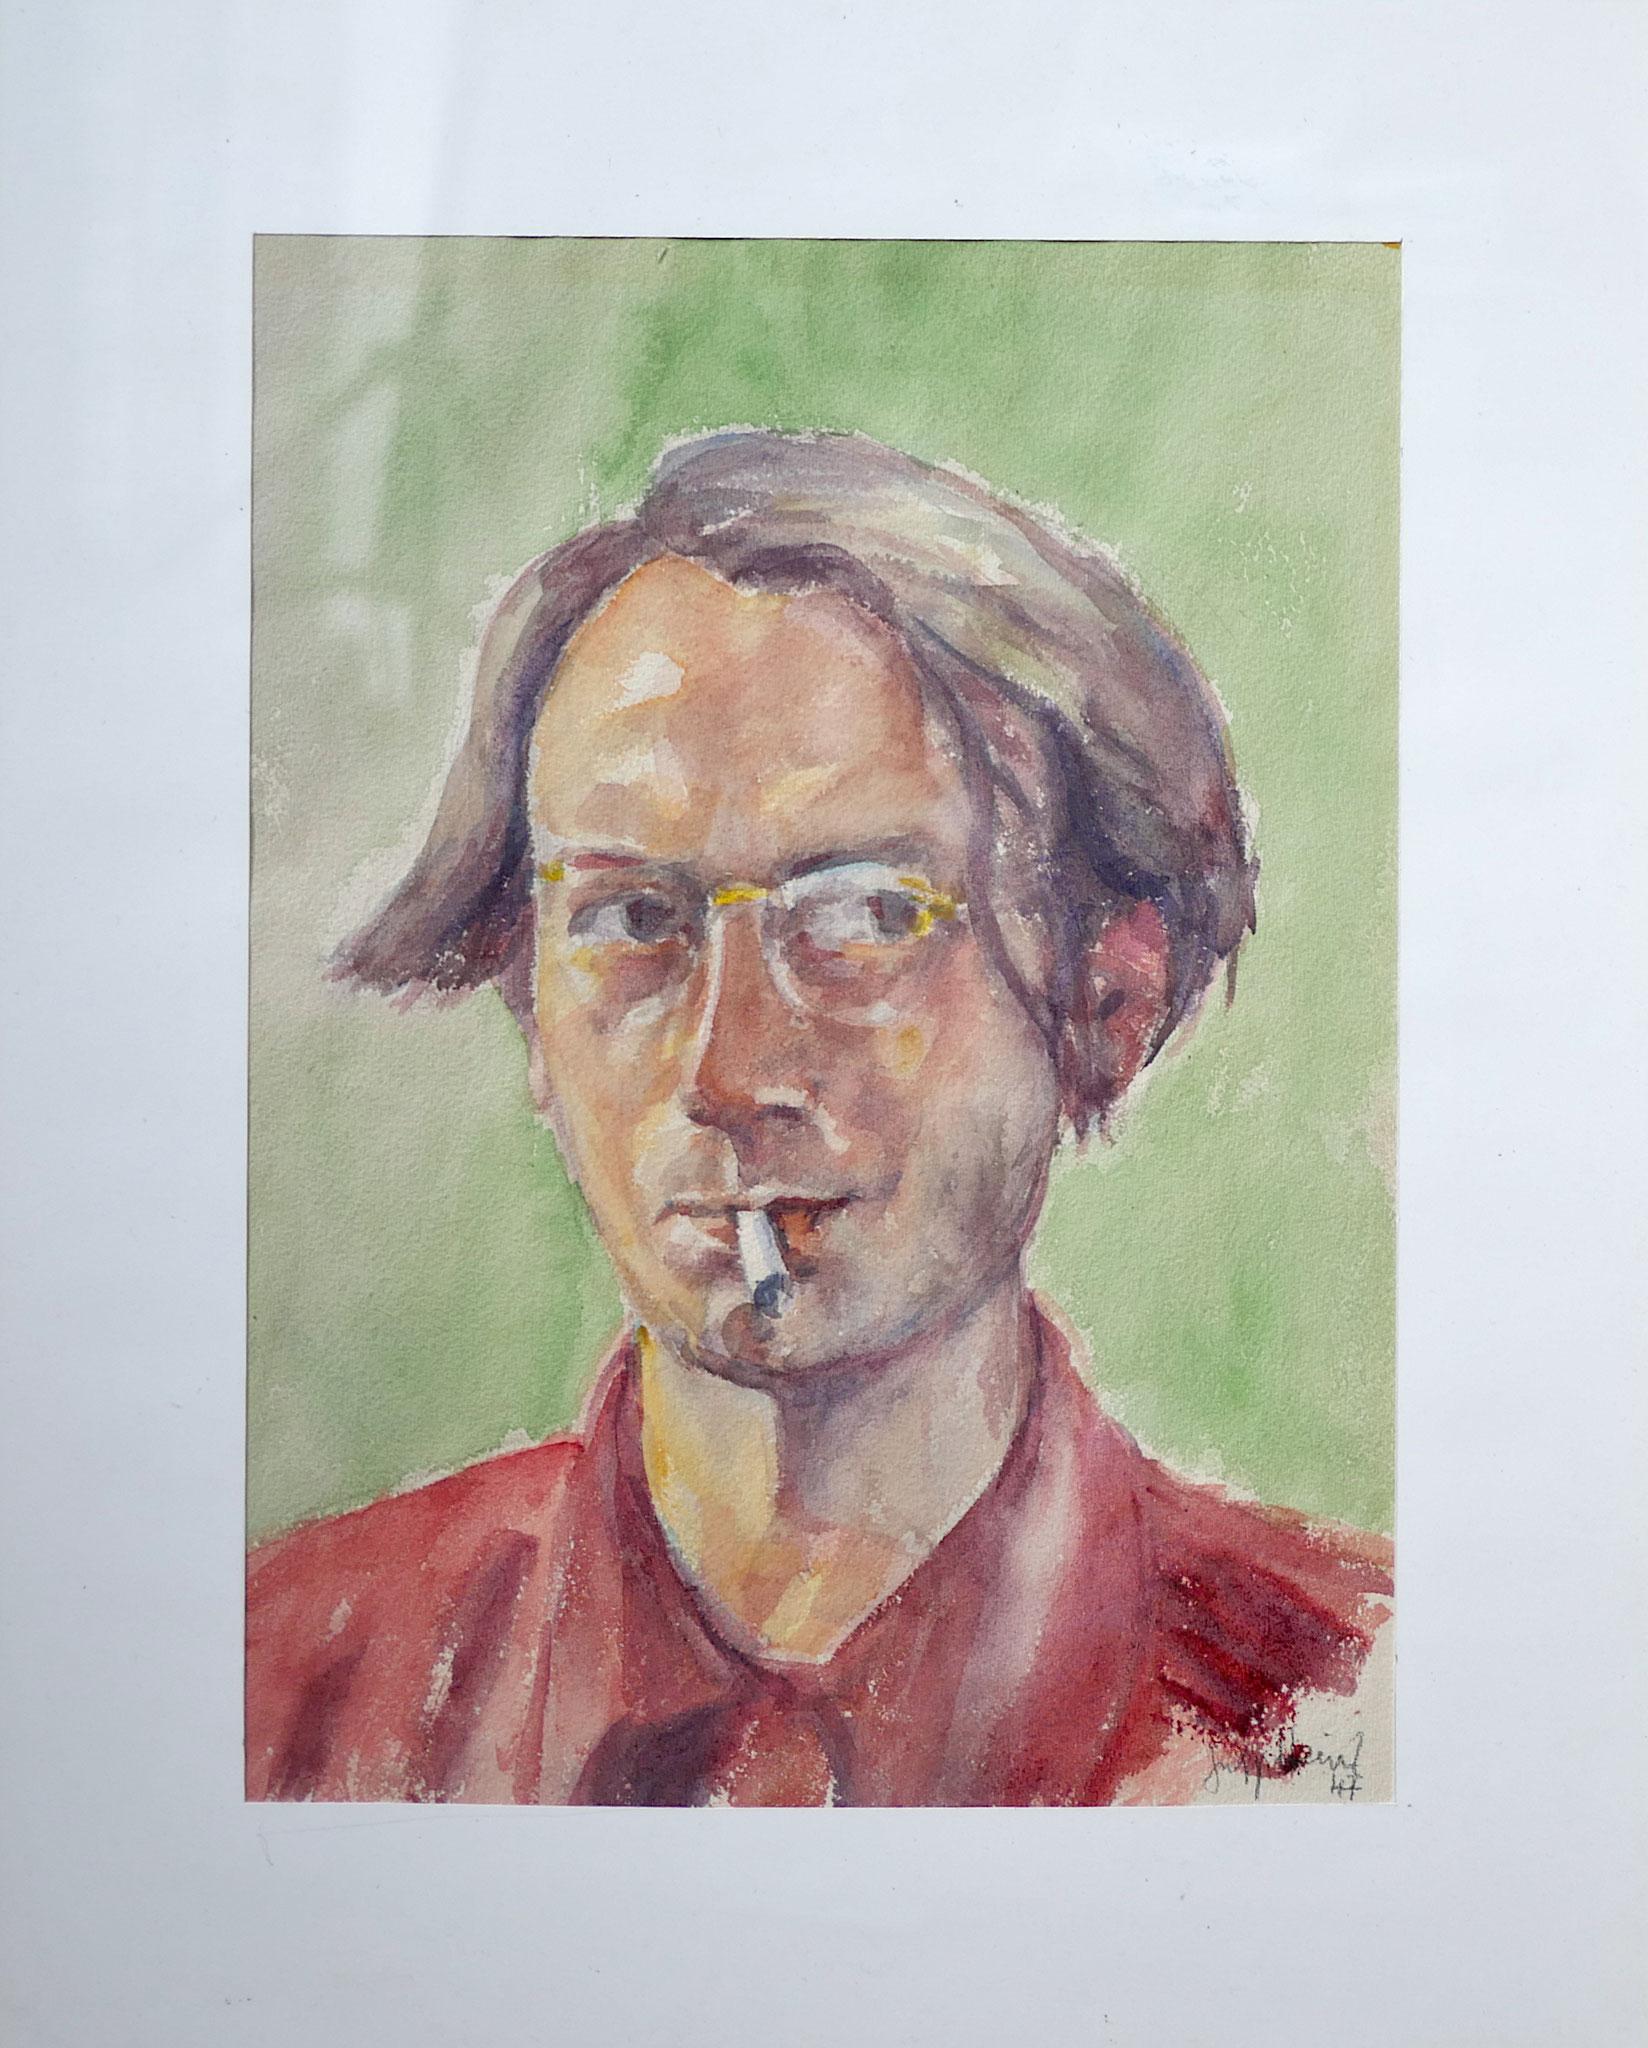 Eigenportrait Aquarell 1947